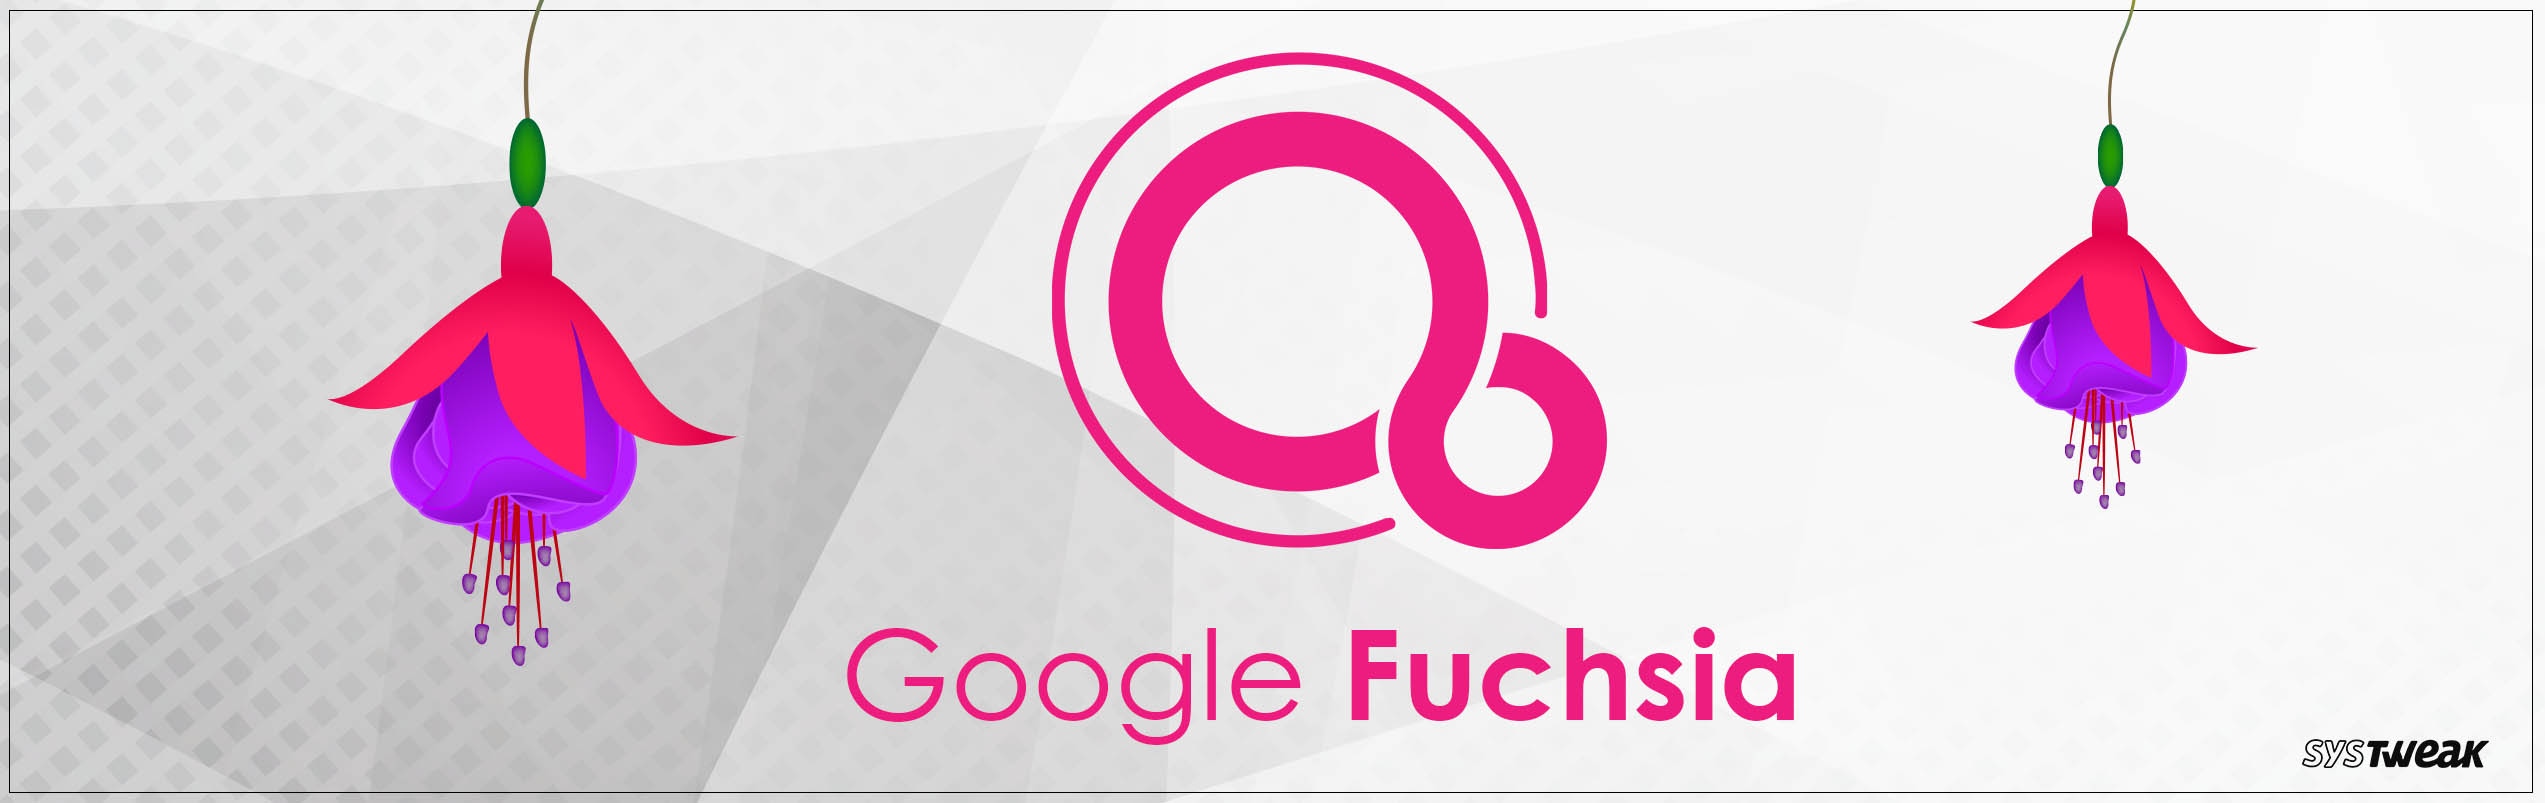 Google Fuchsia: Successor To Android?